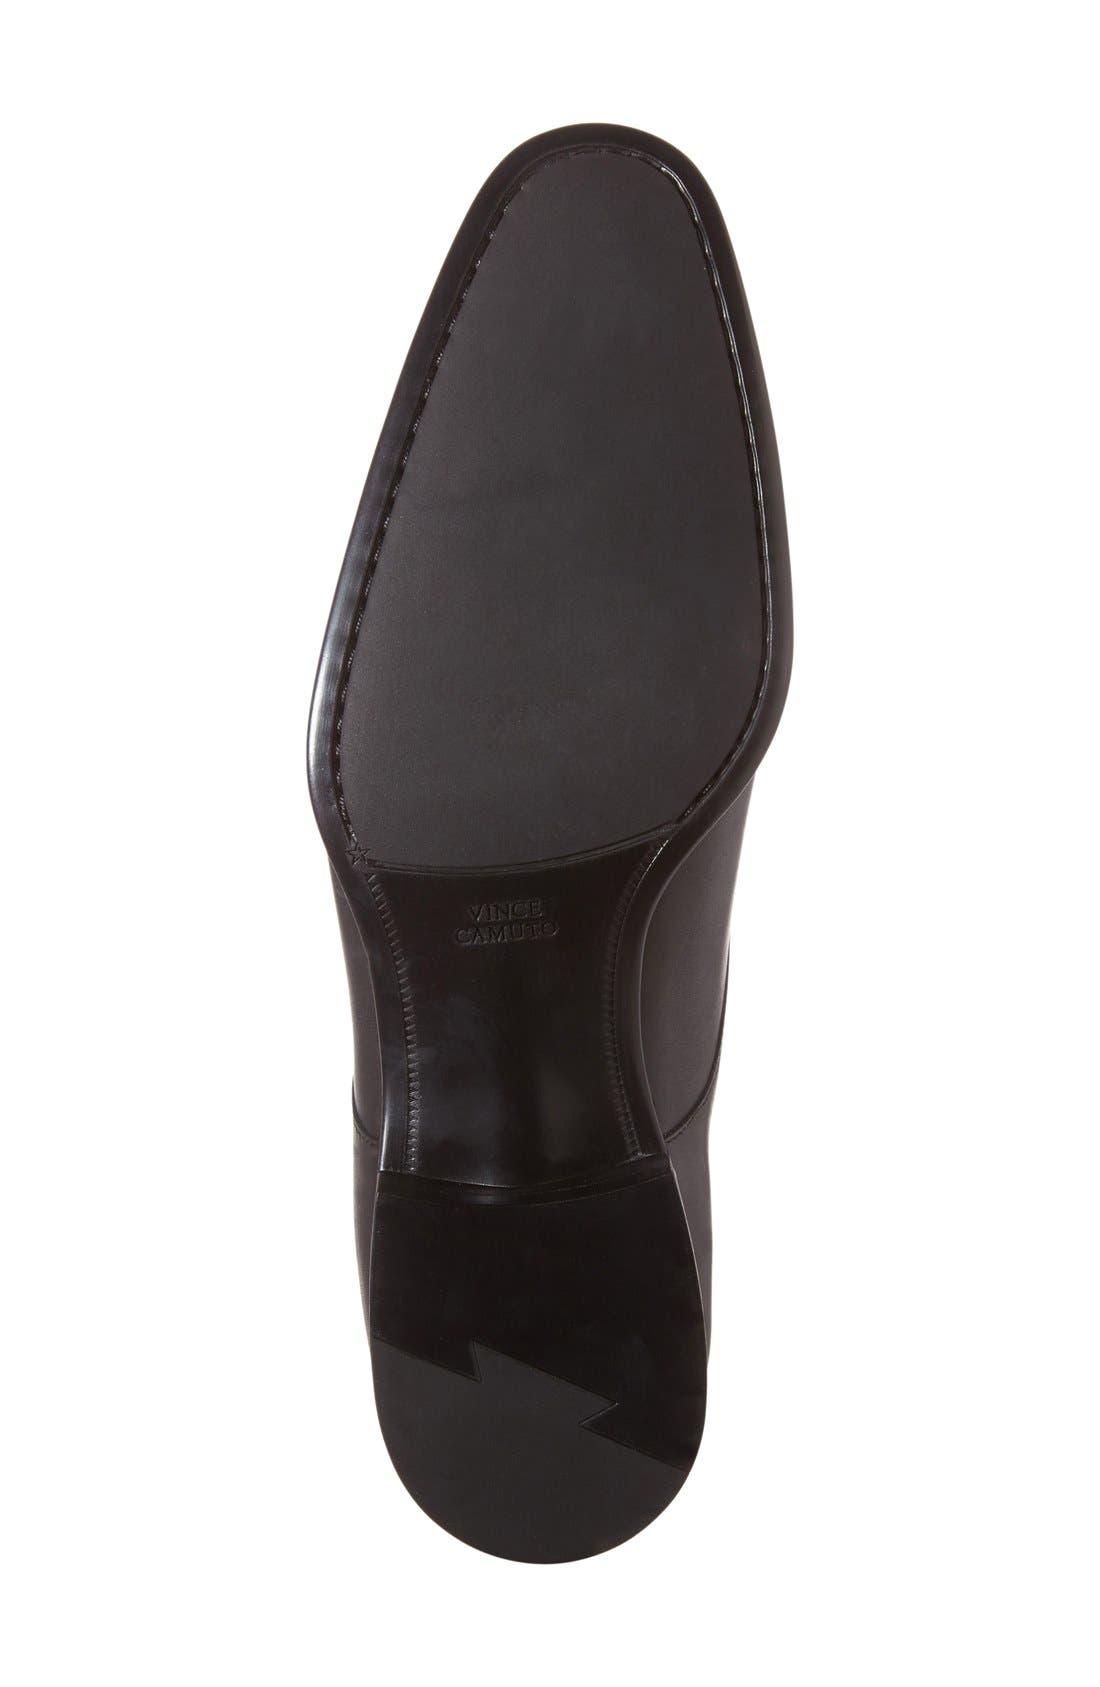 'Trifolo' Monk Strap Shoe,                             Alternate thumbnail 4, color,                             Black Leather